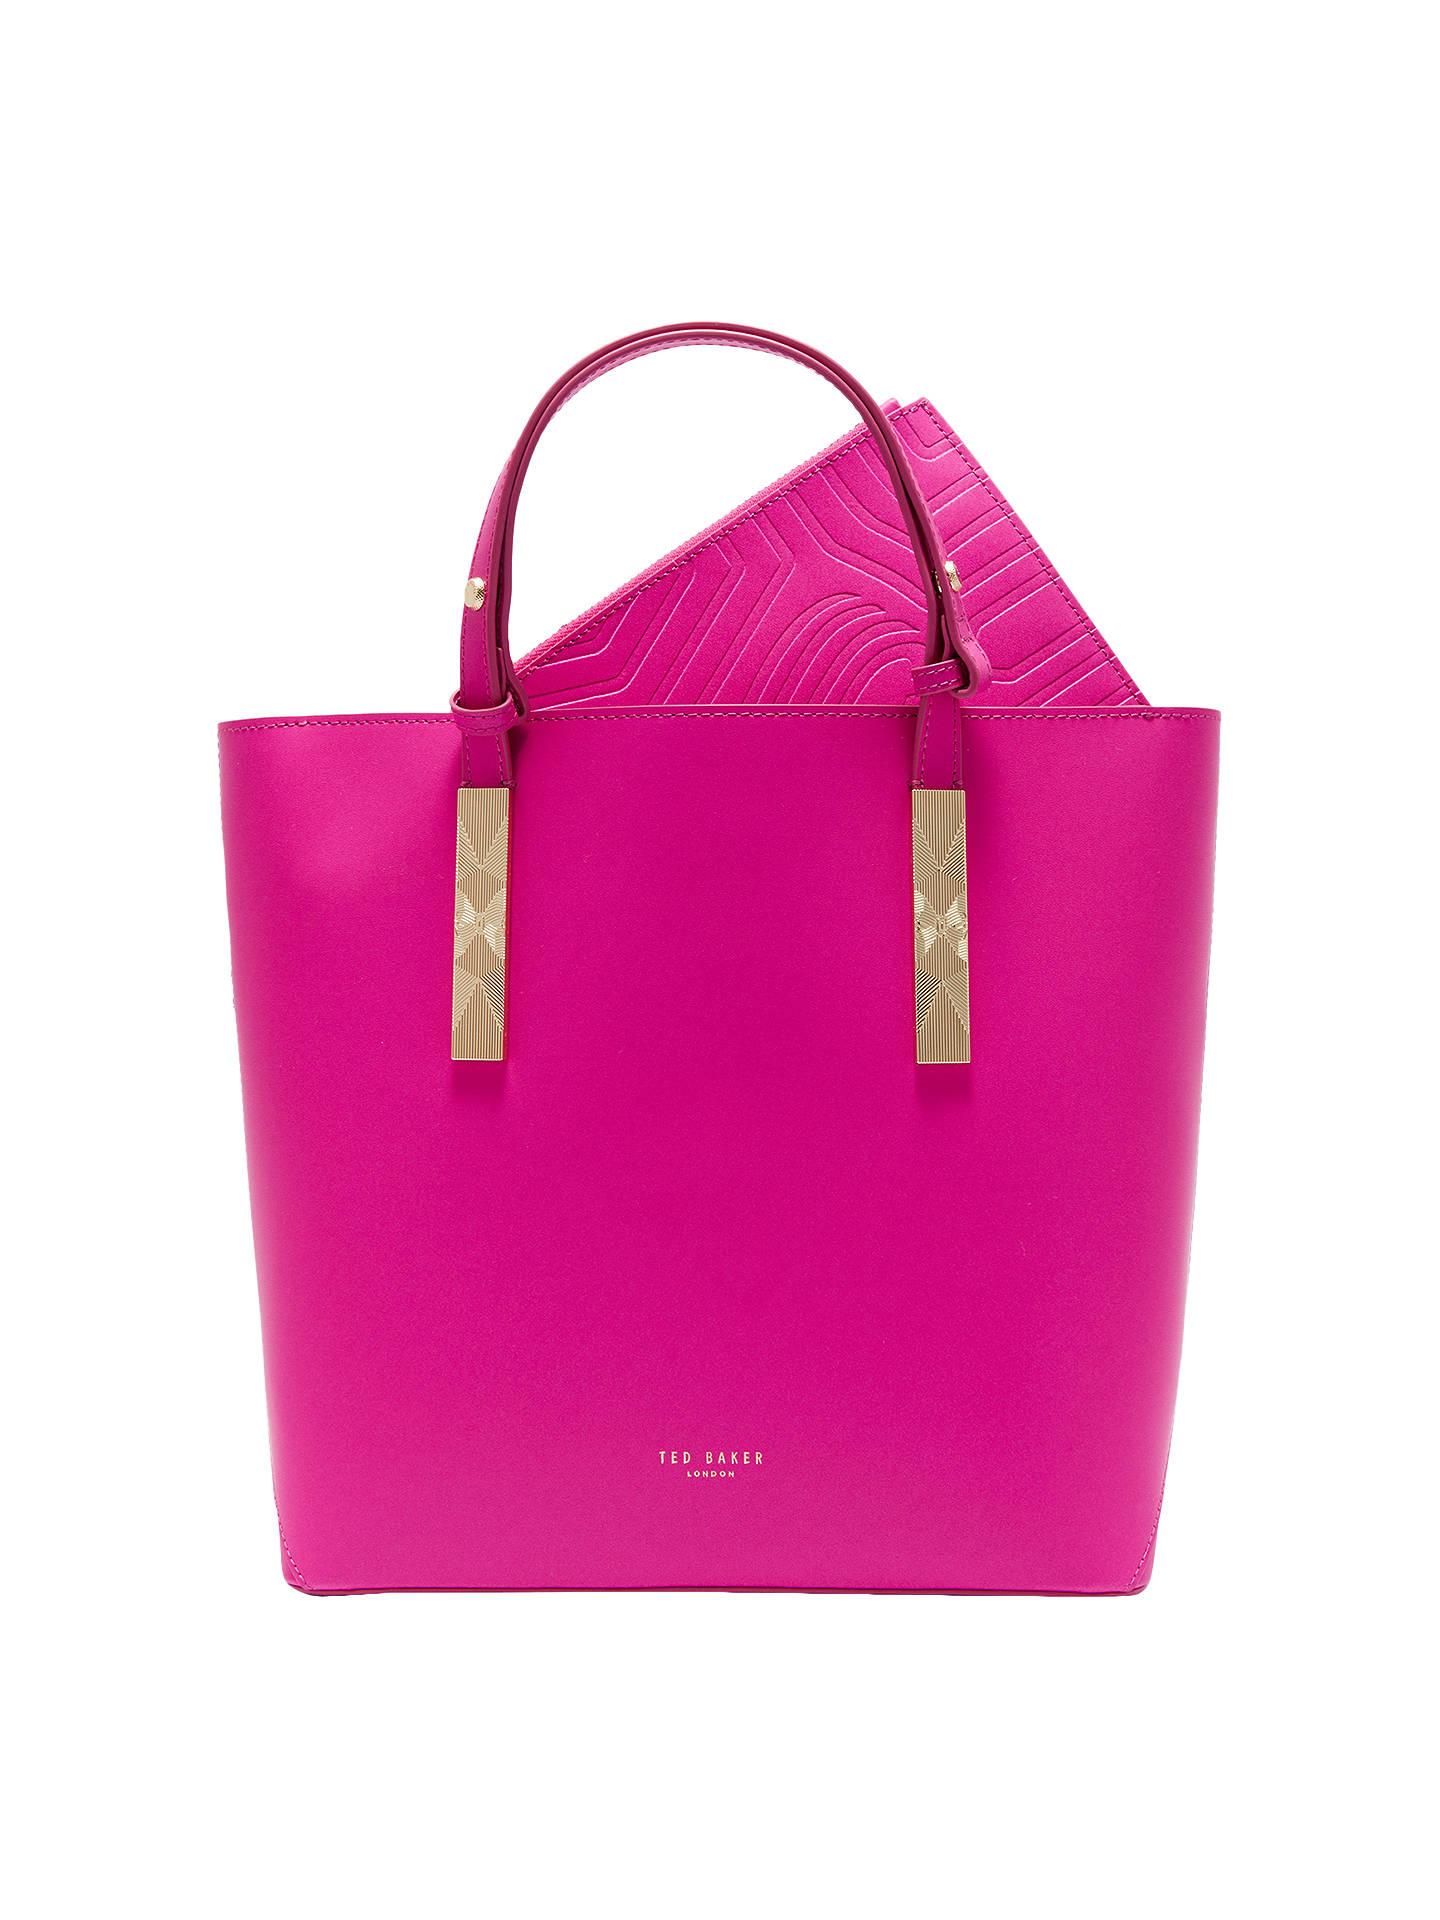 7df607748b8024 Ted Baker Jaceyy Shopper Bag at John Lewis   Partners